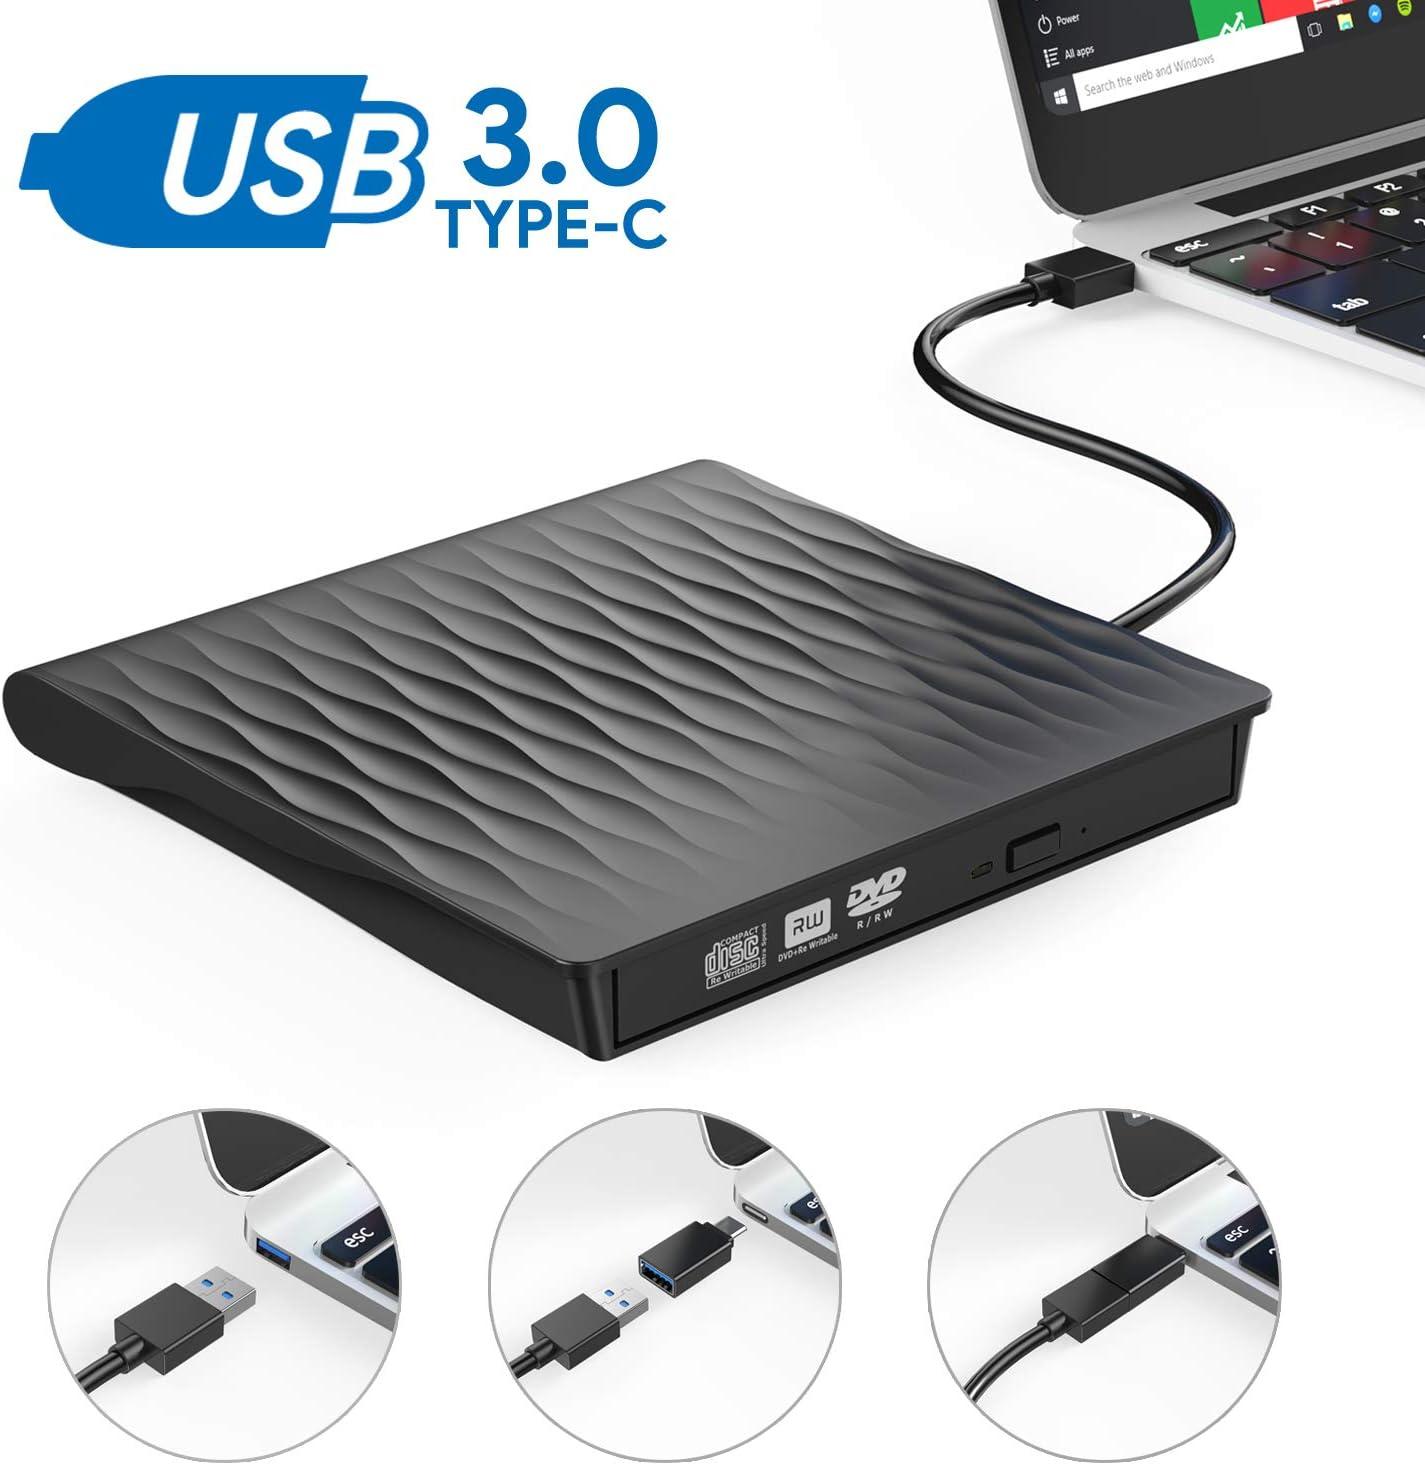 USB 2.0 External CD//DVD Drive for Compaq presario v3707tx